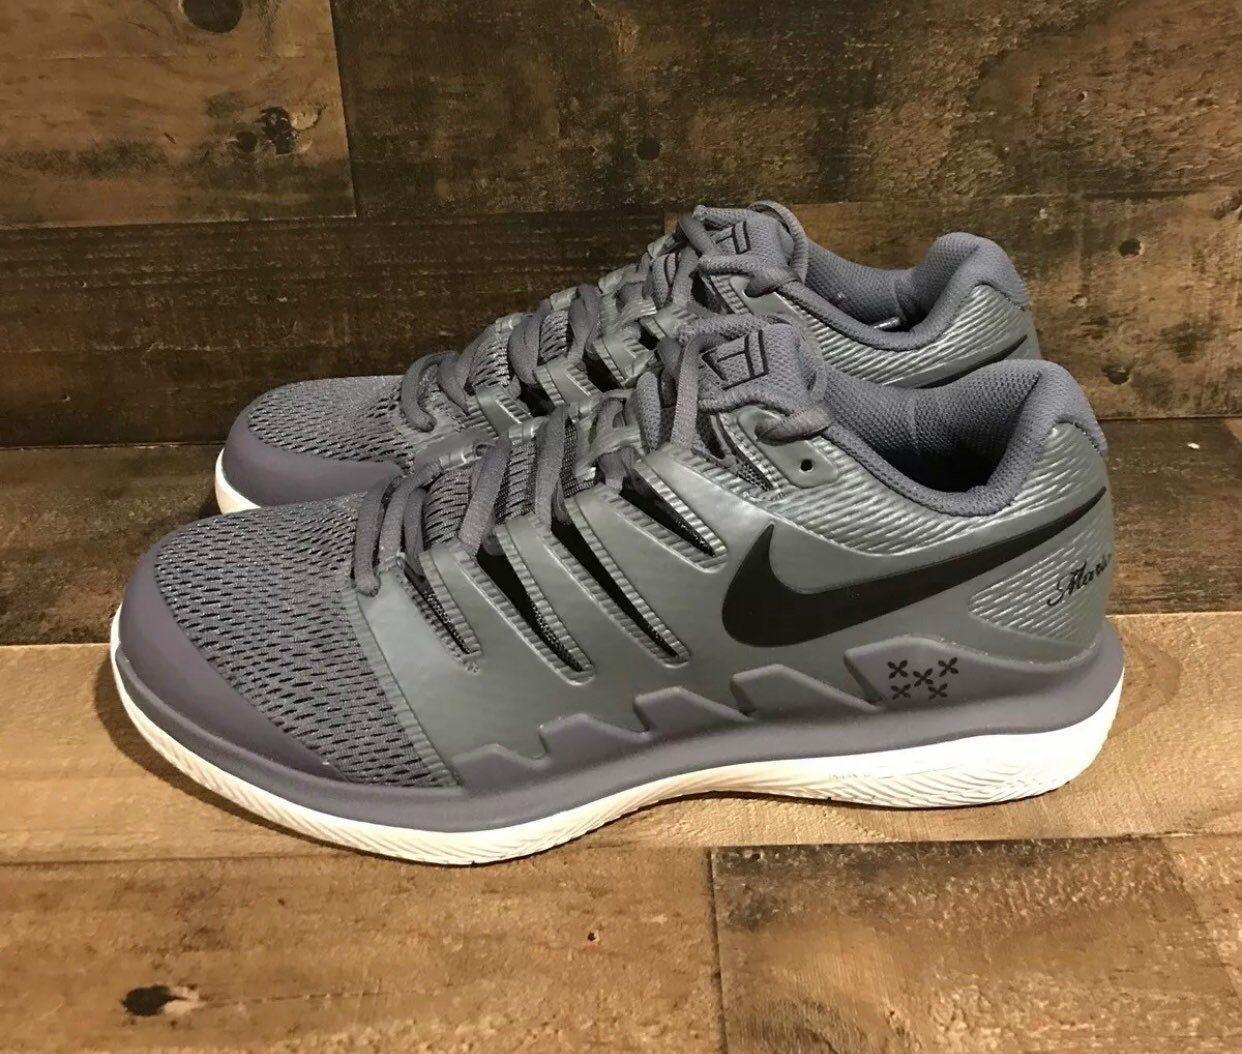 Nike Air Zoom Vapor X Hard Court Tennis